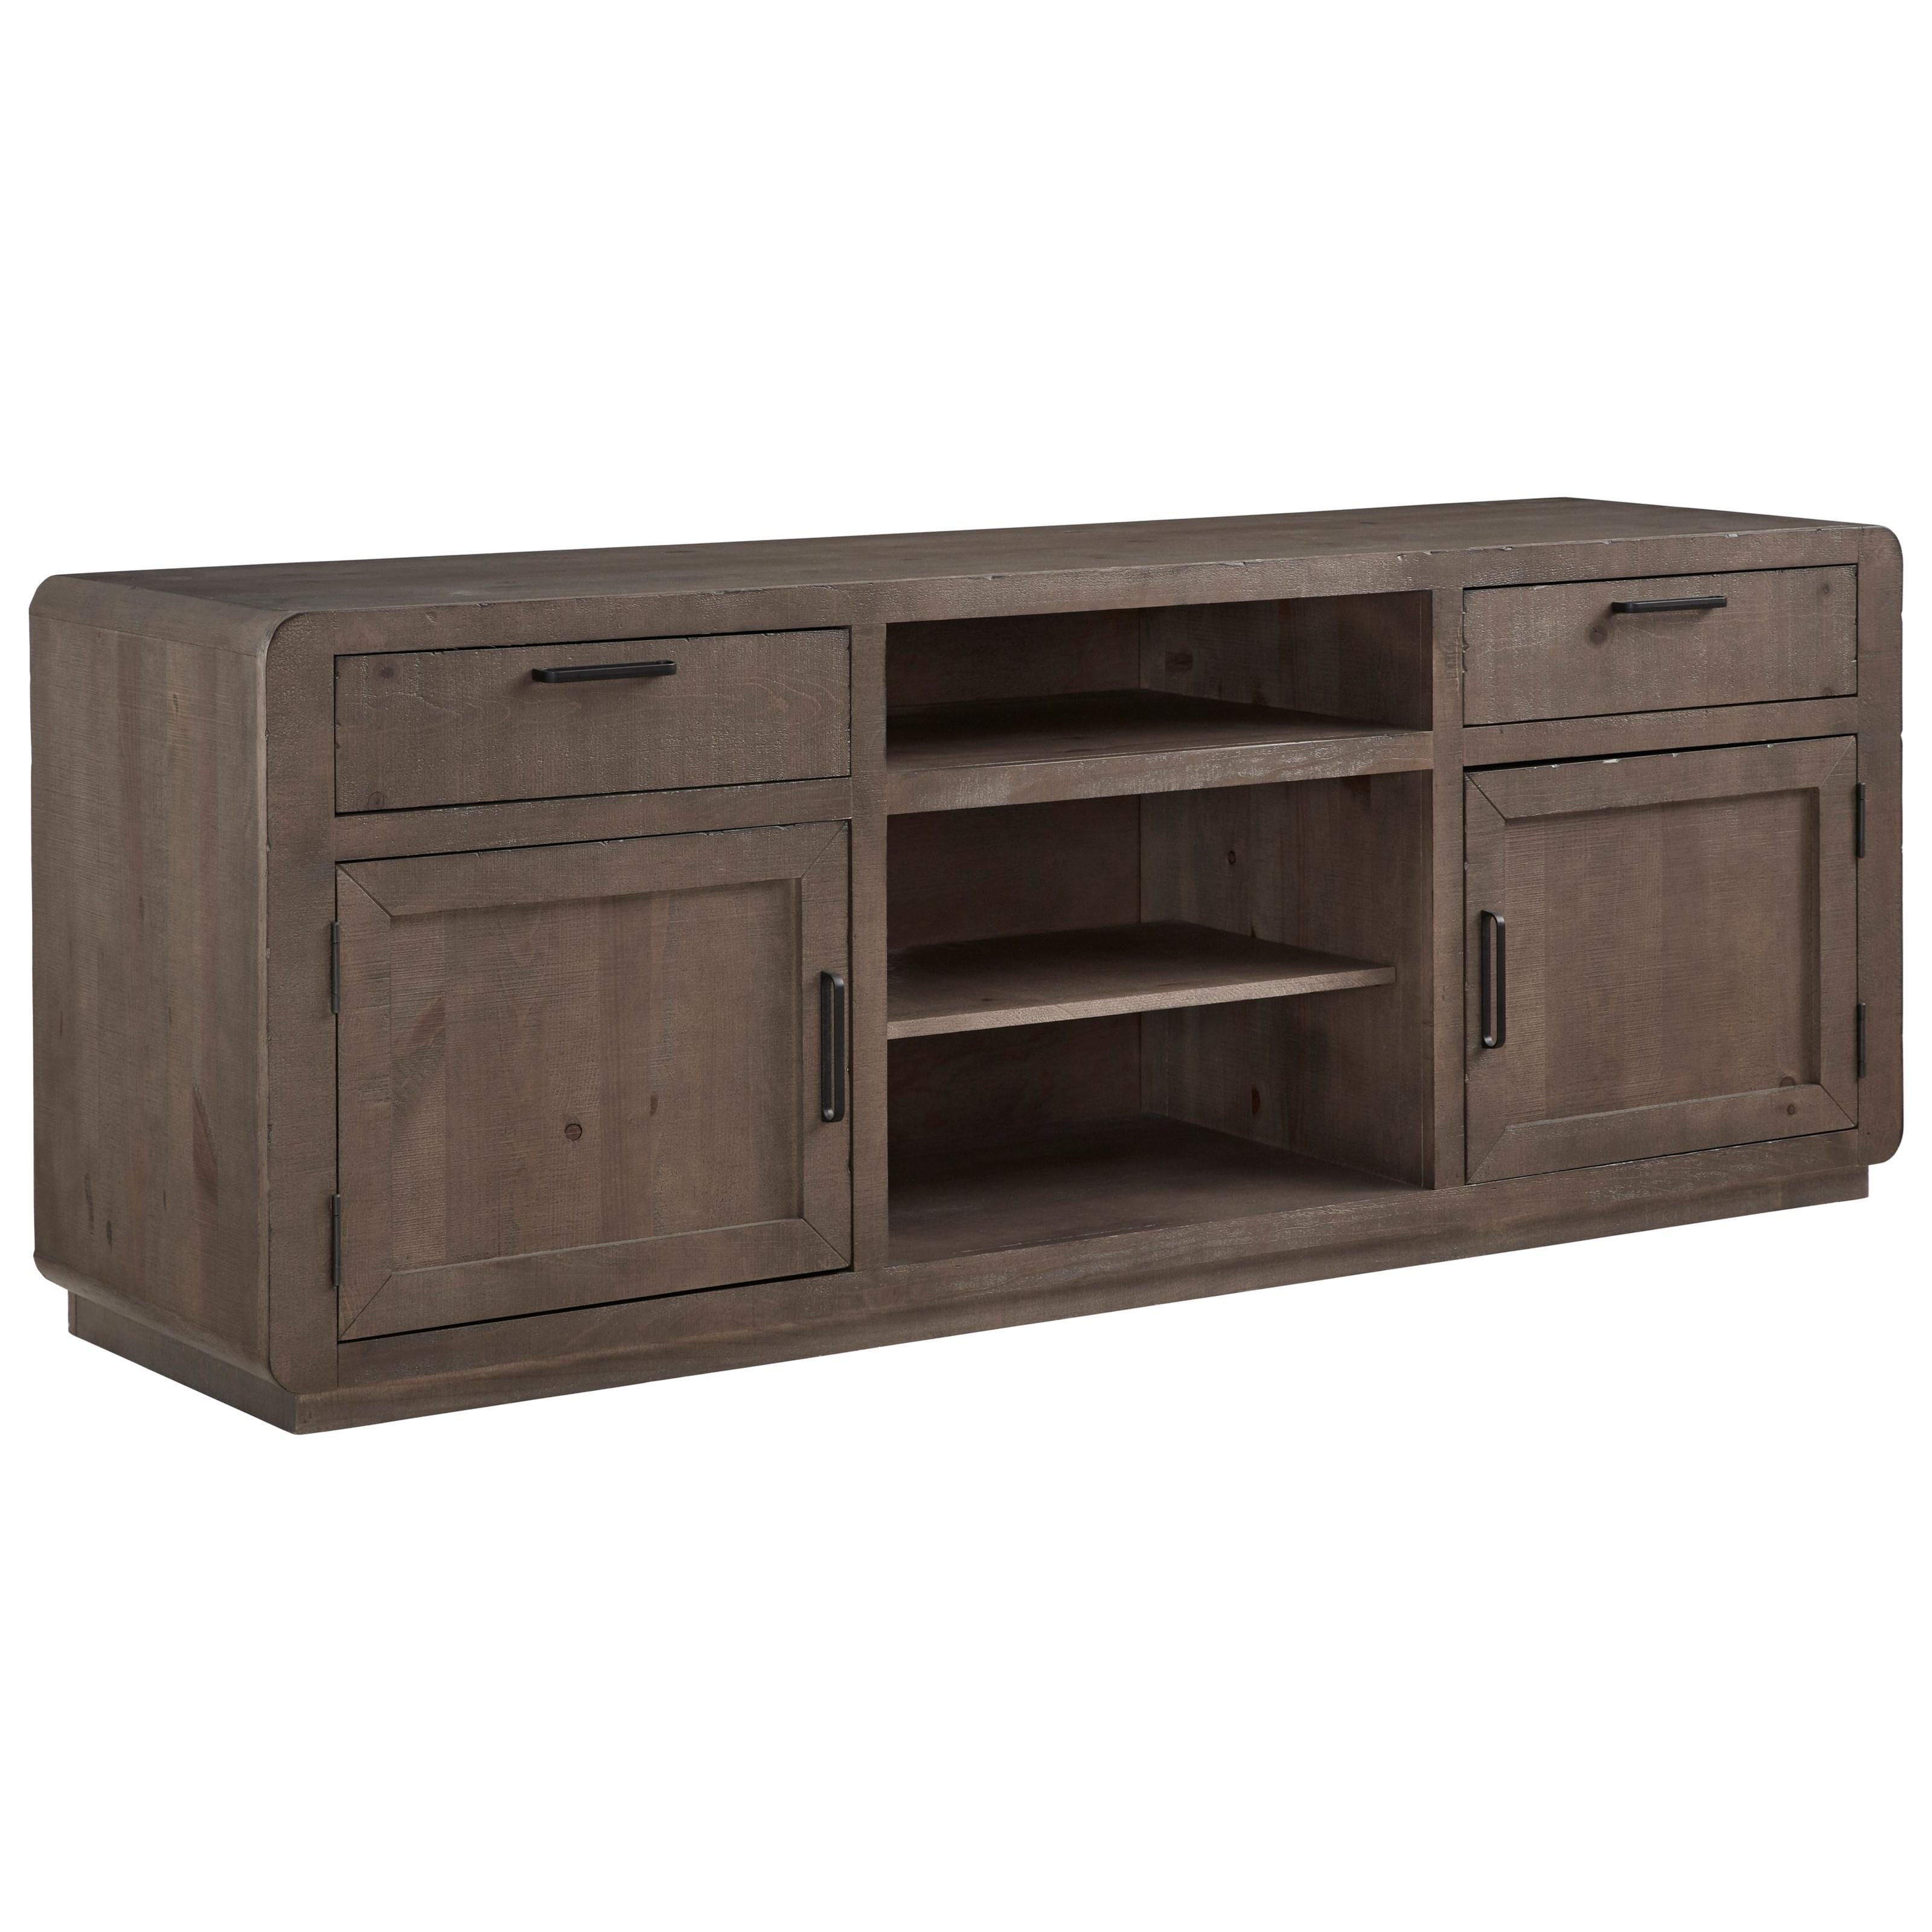 "Allure 74"" Console by Progressive Furniture at Van Hill Furniture"